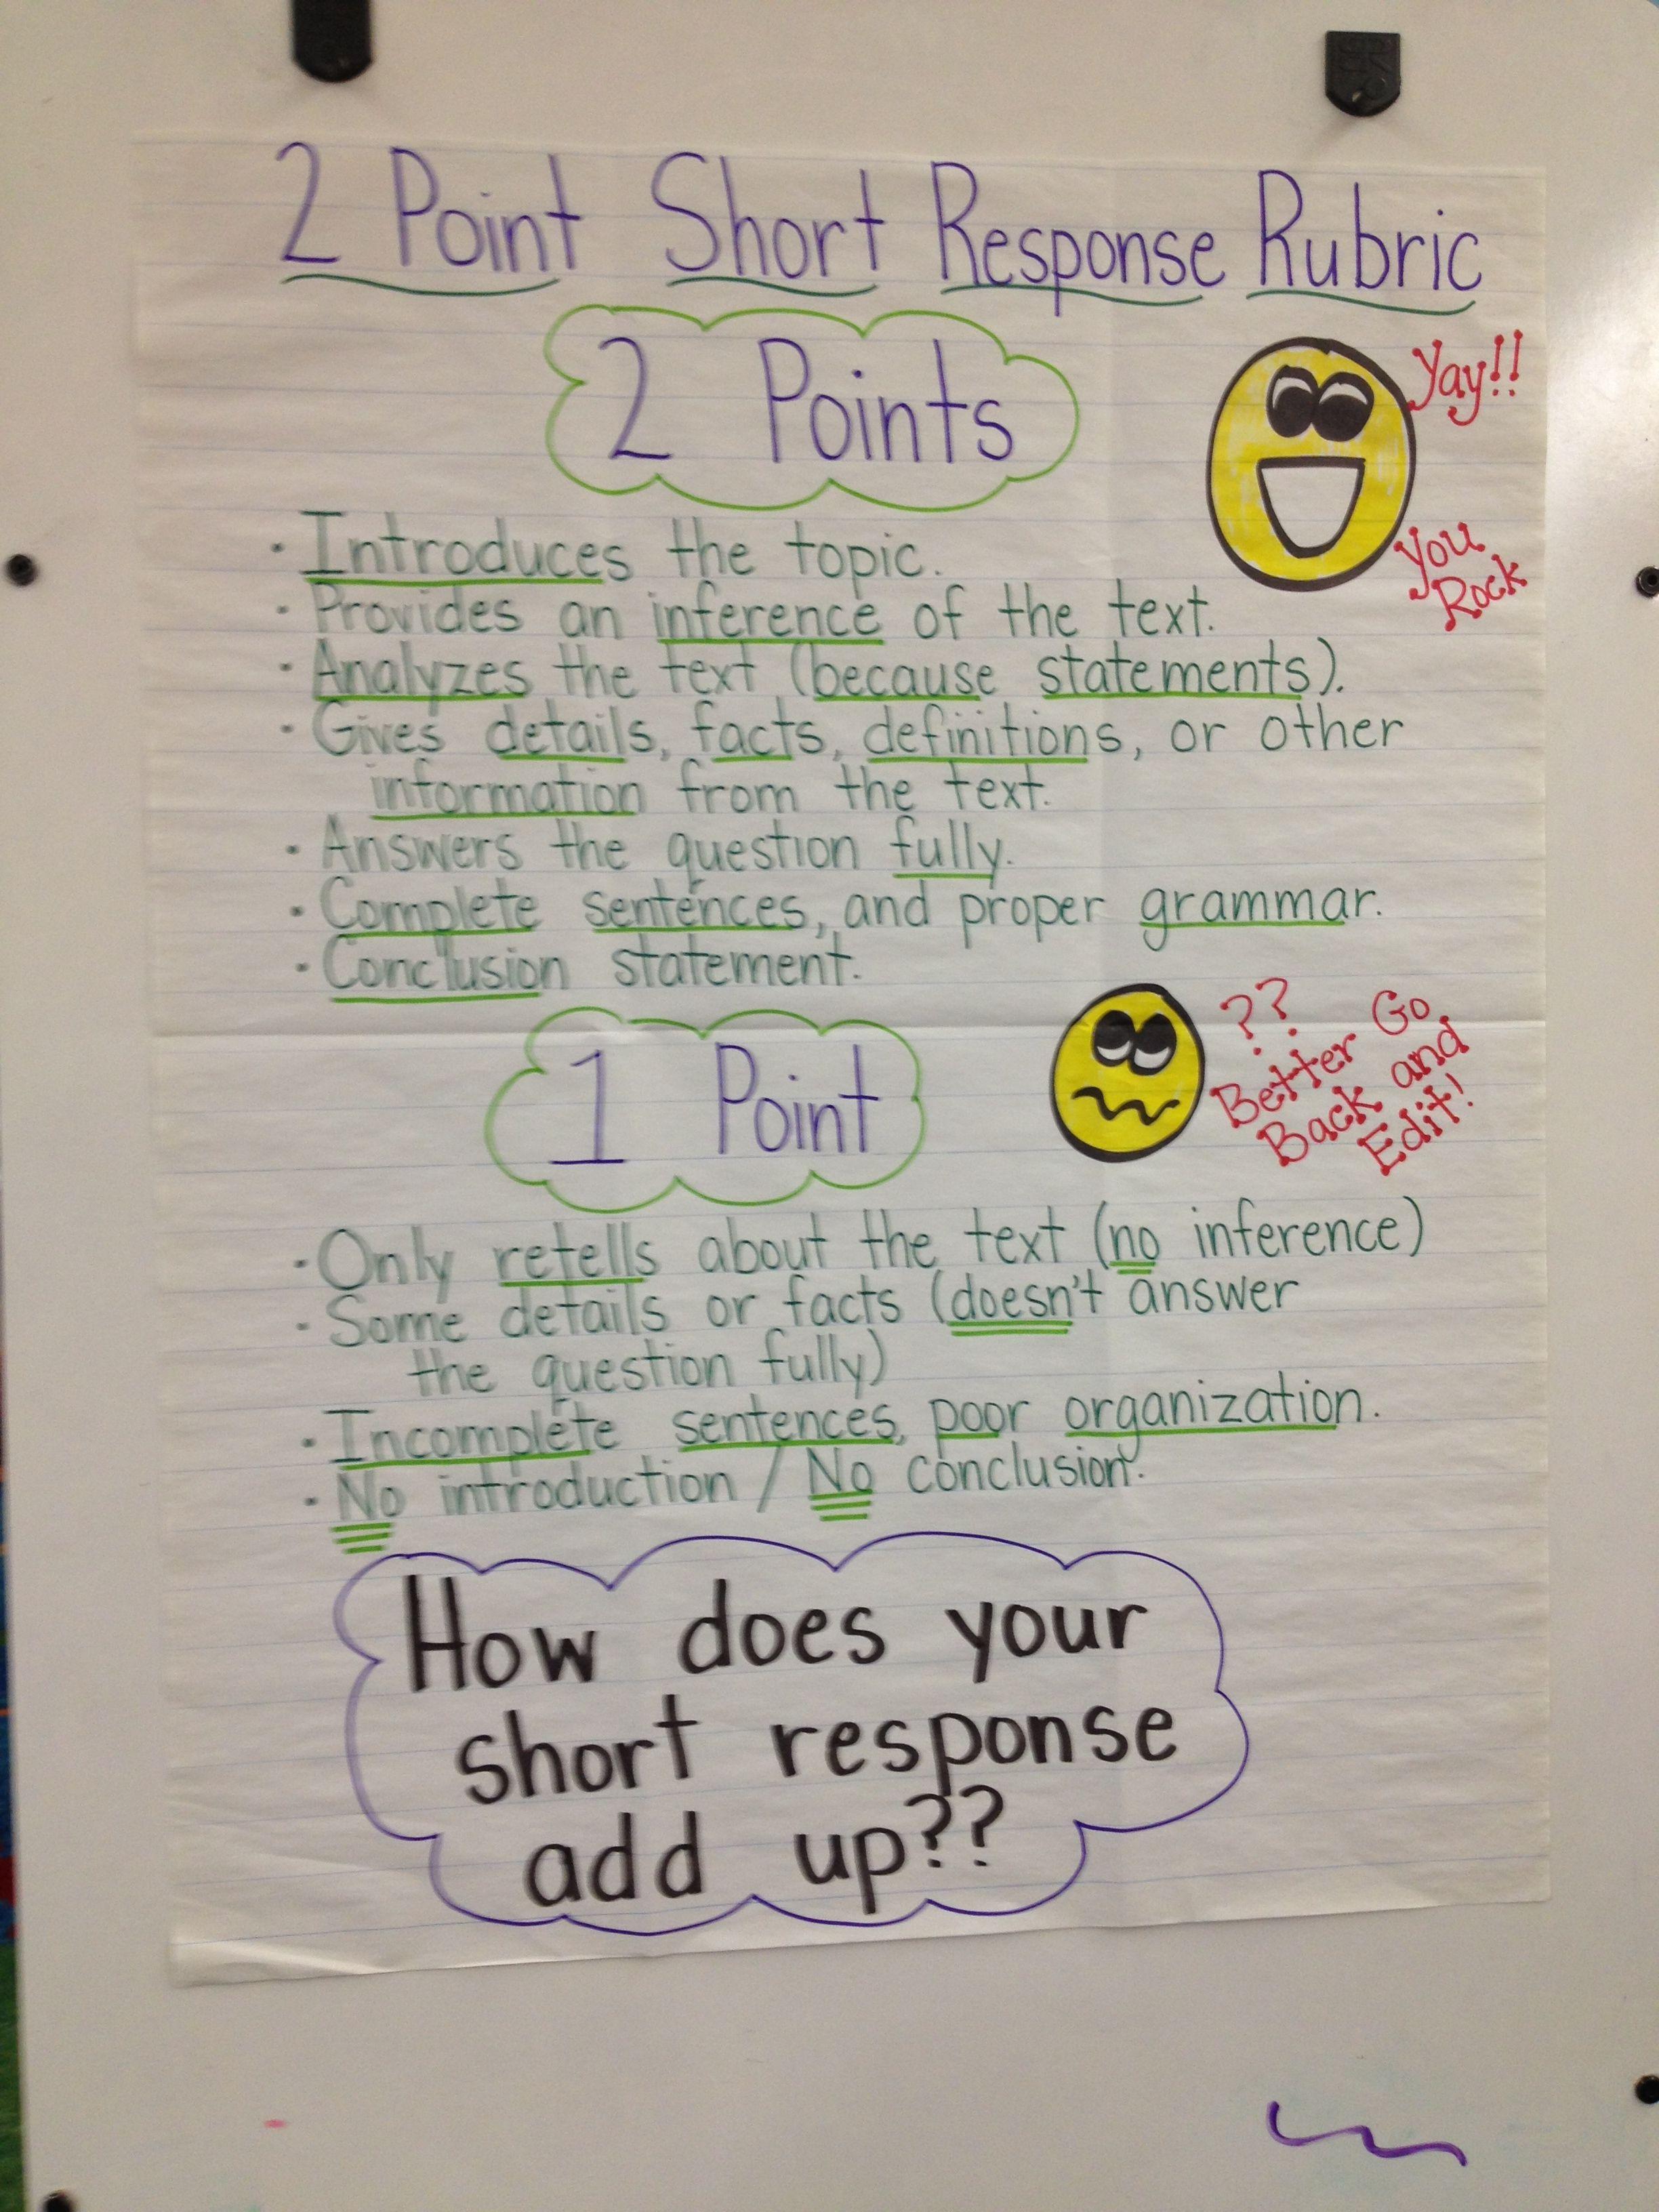 Nys Short Response 2 Point Rubric